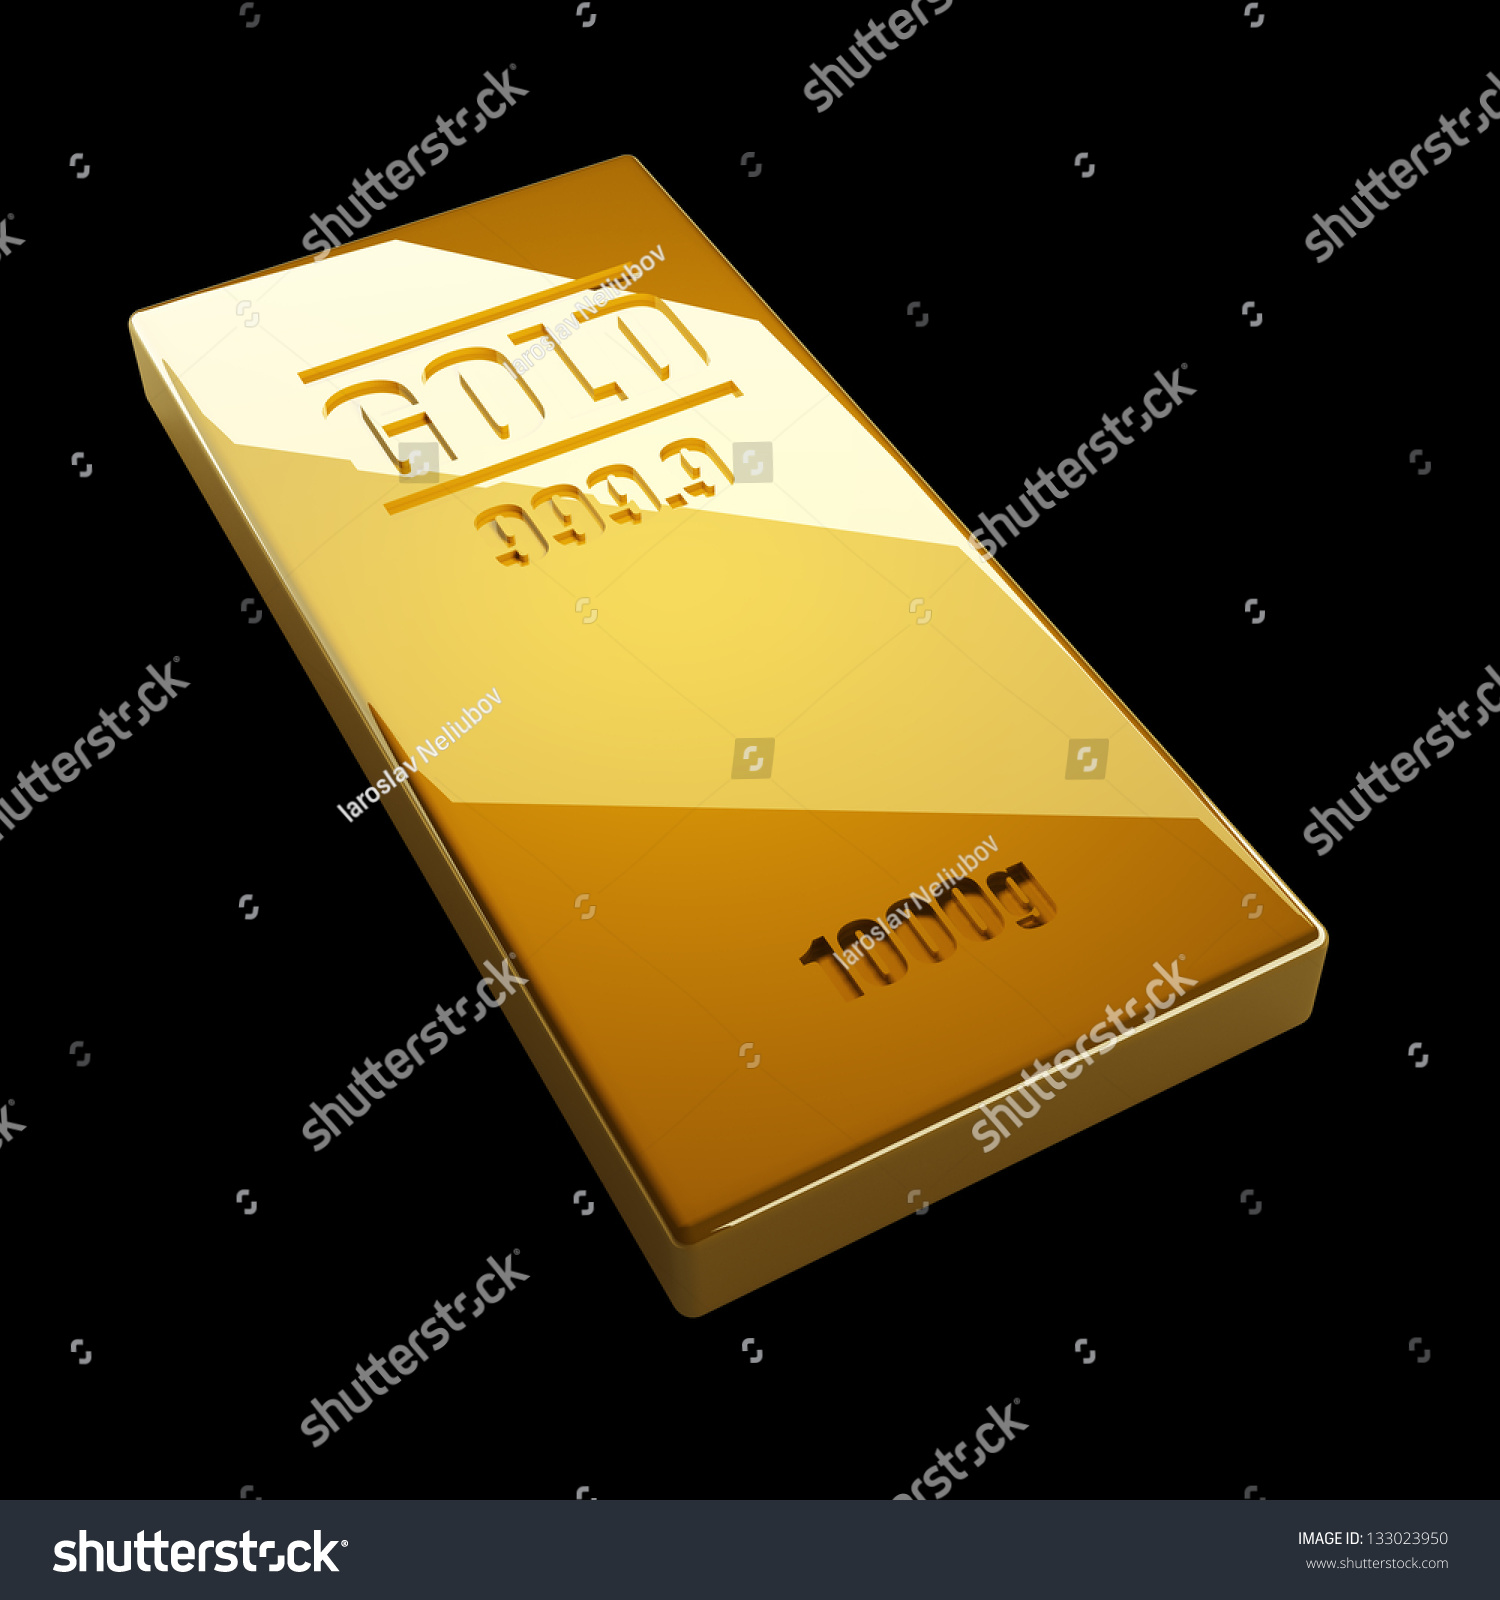 gold bar black background - photo #21